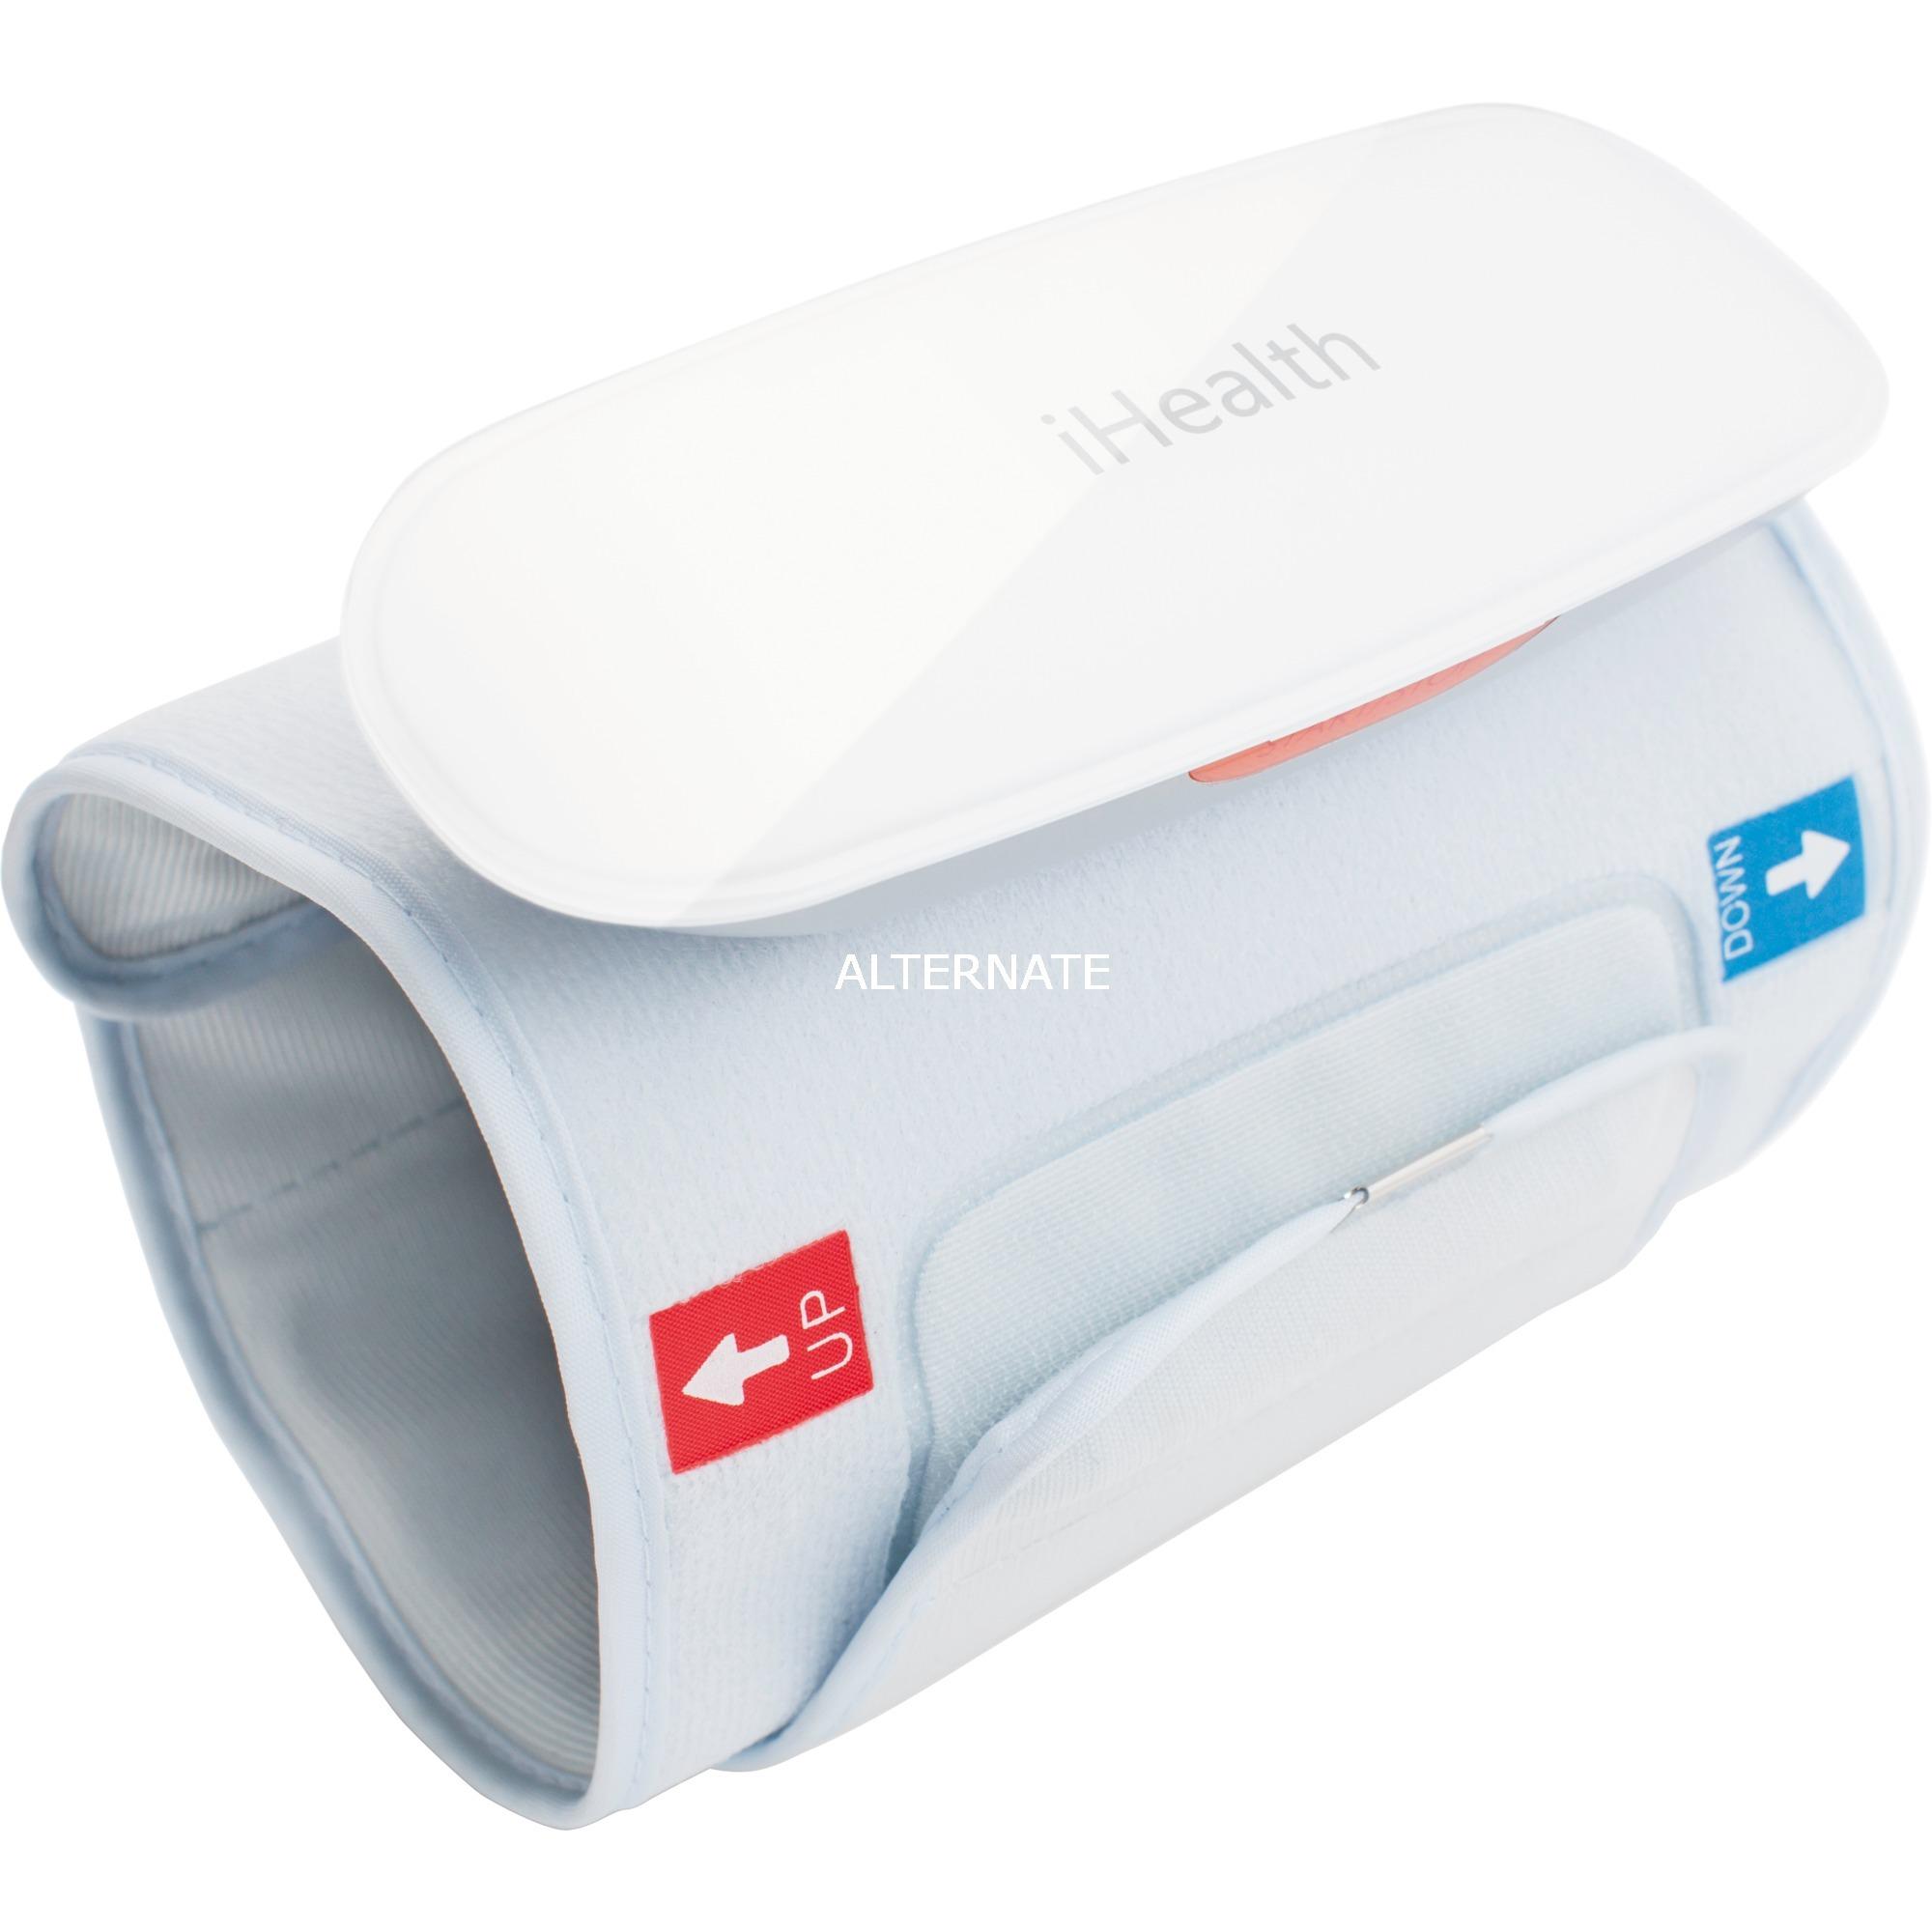 iHealth Feel BP5 vernetztes Oberarm-Blutdruckmessgerät